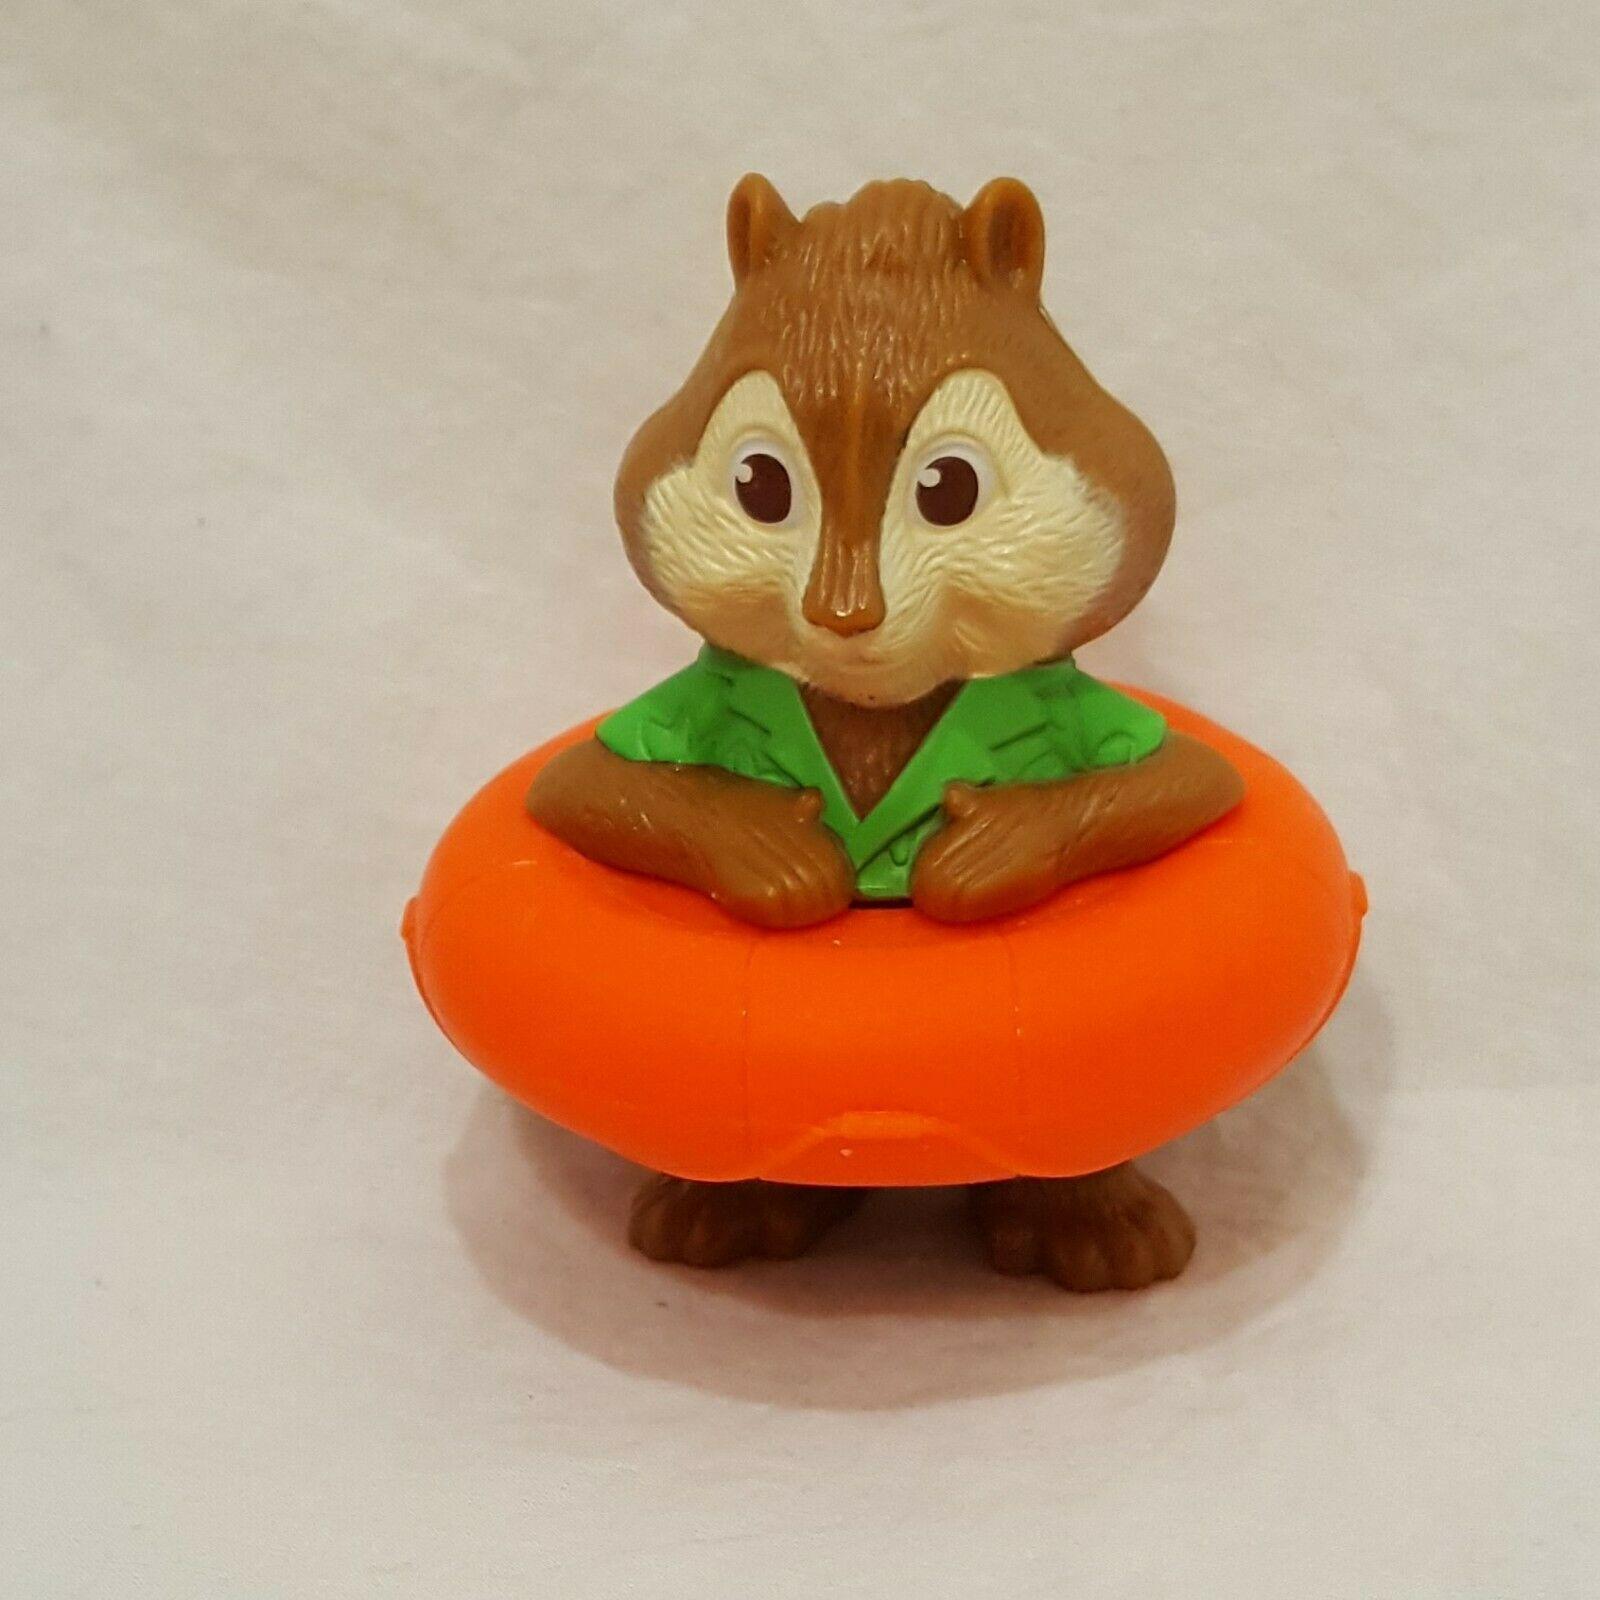 "Theodore Toy Figurine Alvin & Chipmunks 3 Chipwrecked Loose McDonalds 2011 3"""